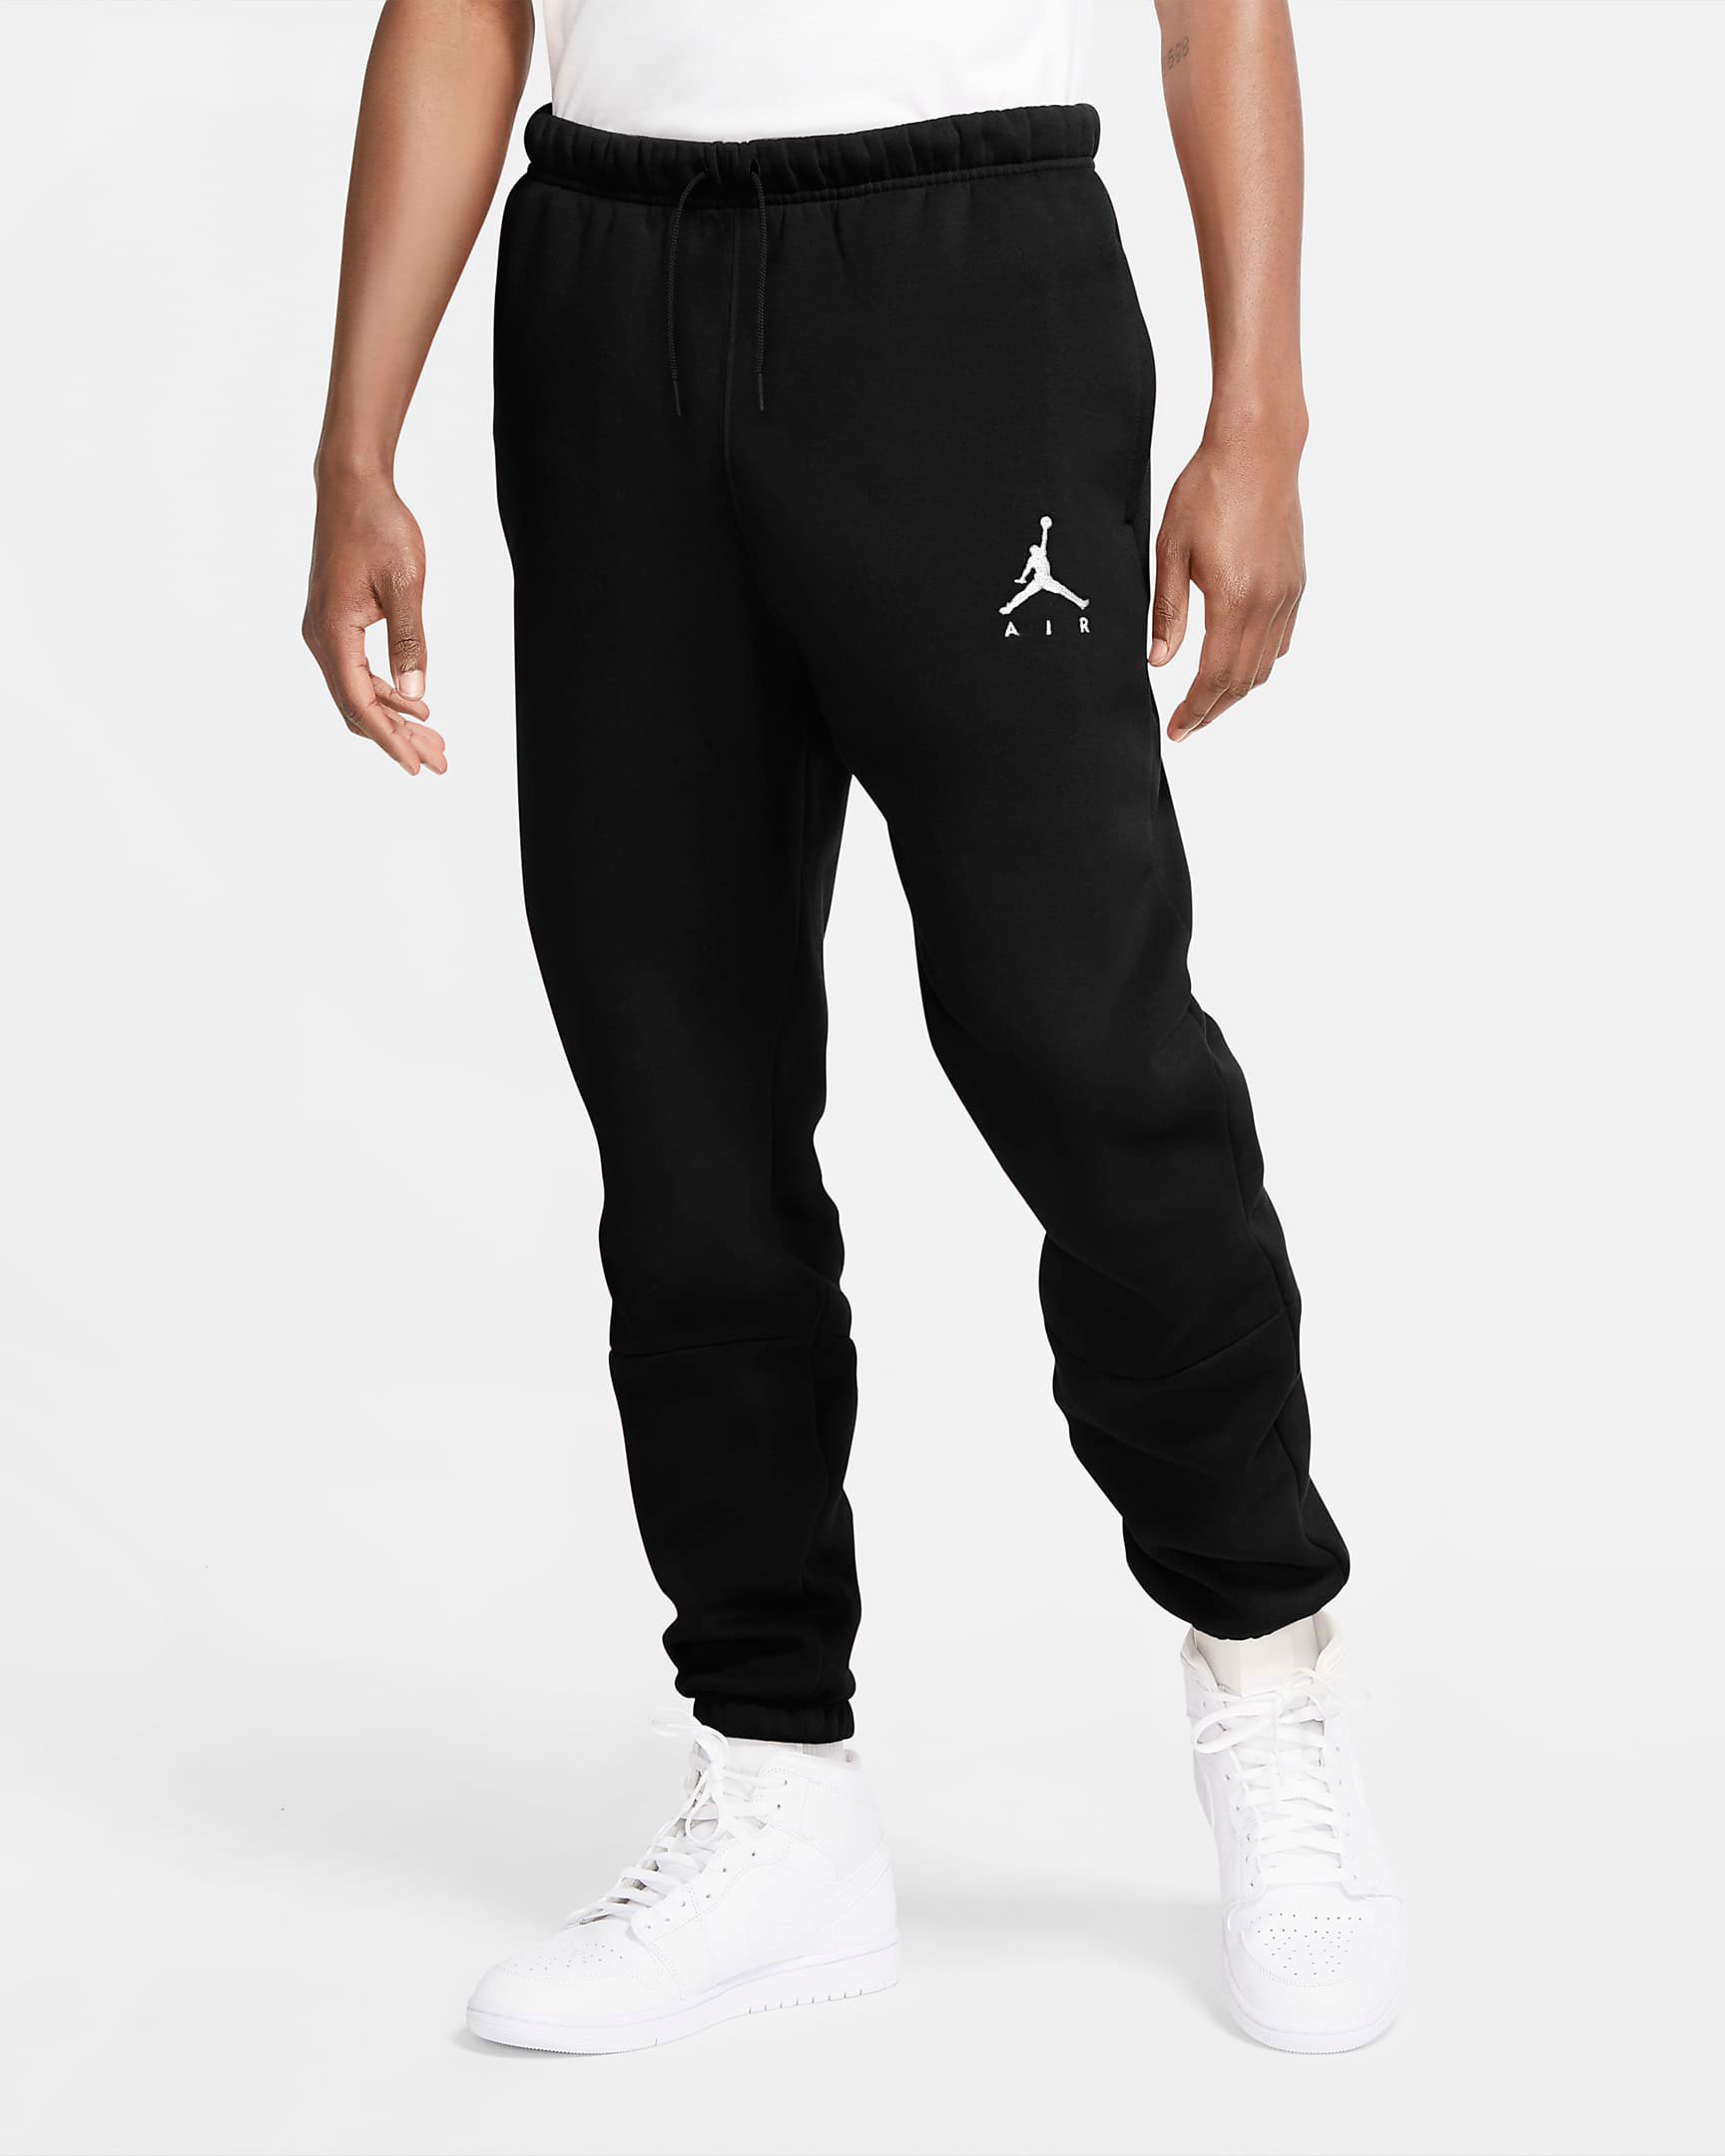 jordan-11-adapt-white-pants-match